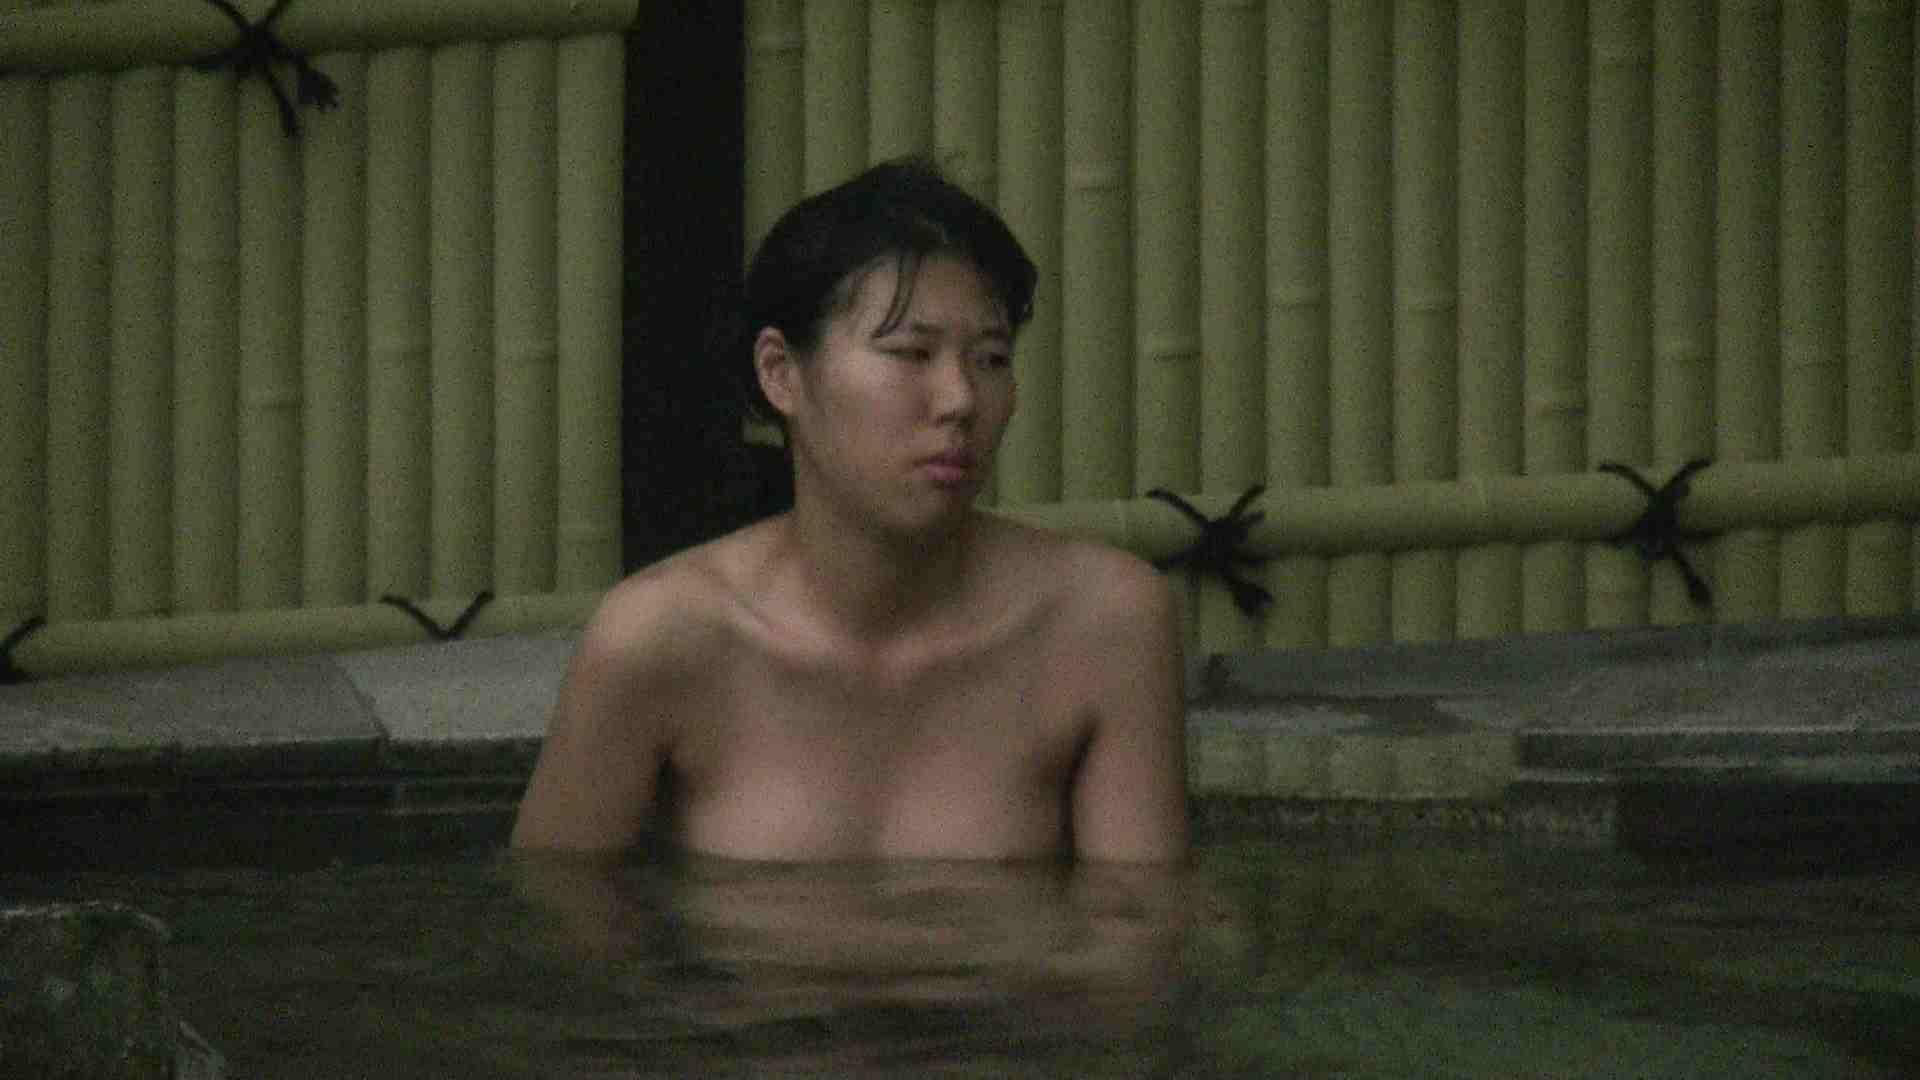 Aquaな露天風呂Vol.215 露天 | OL女体  74連発 49